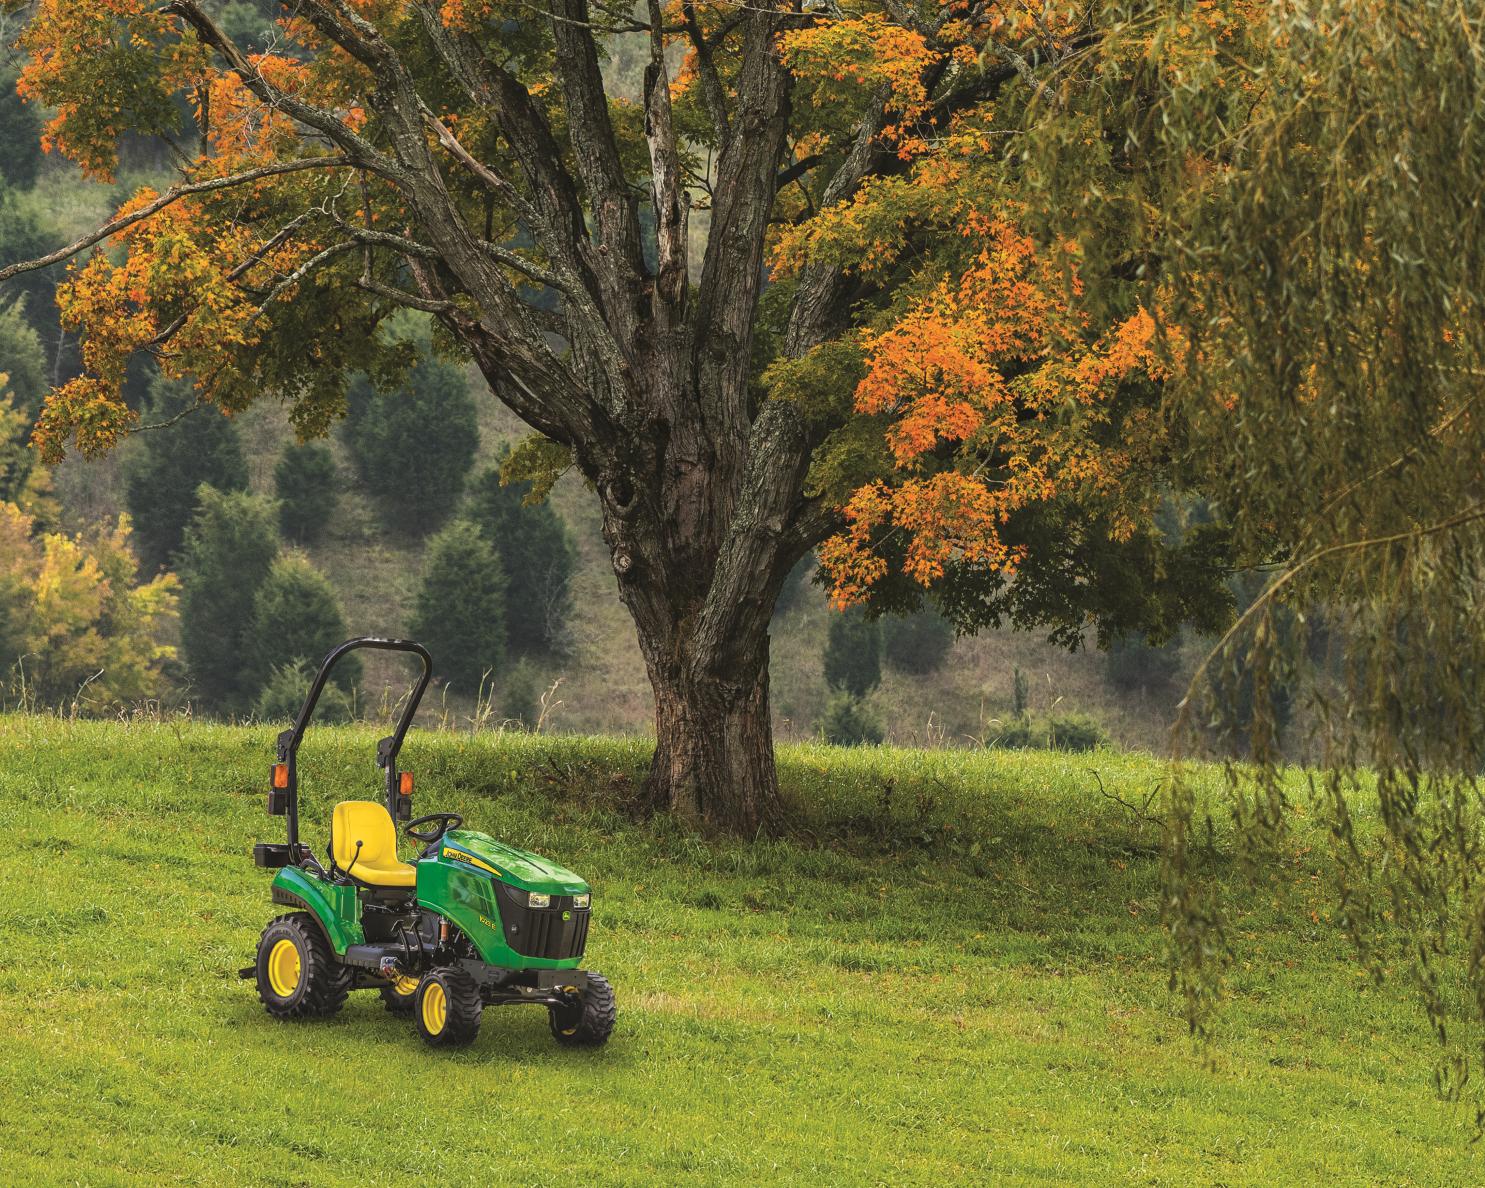 John Deere 1023E Compact Tractor_r4x000059